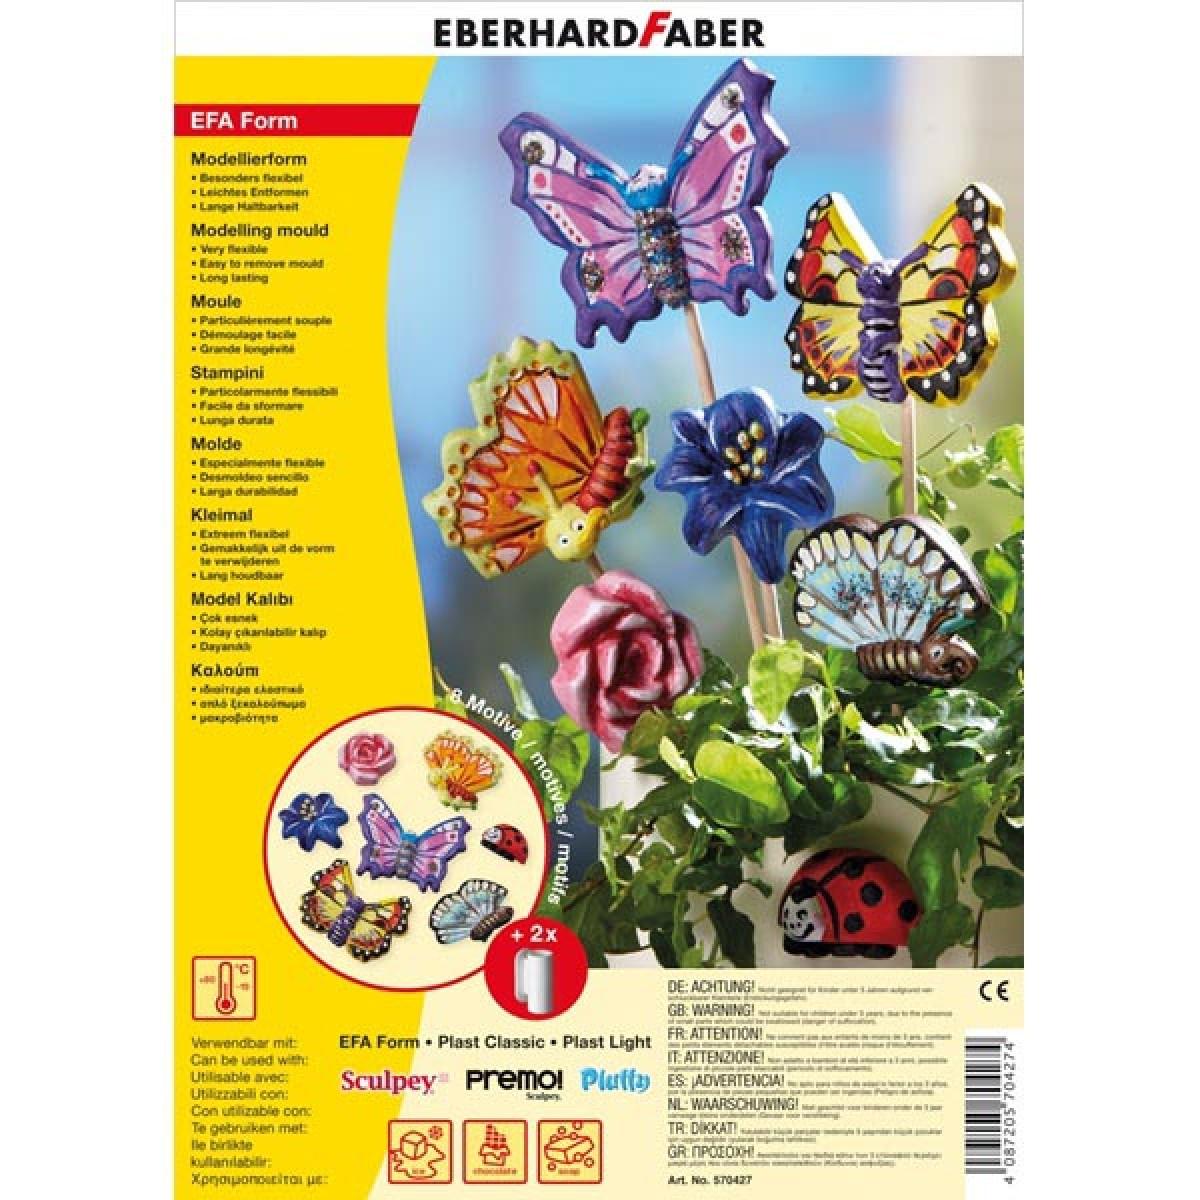 Eberhard Faber Καλούπι Butterfly Είδη Ζωγραφικής